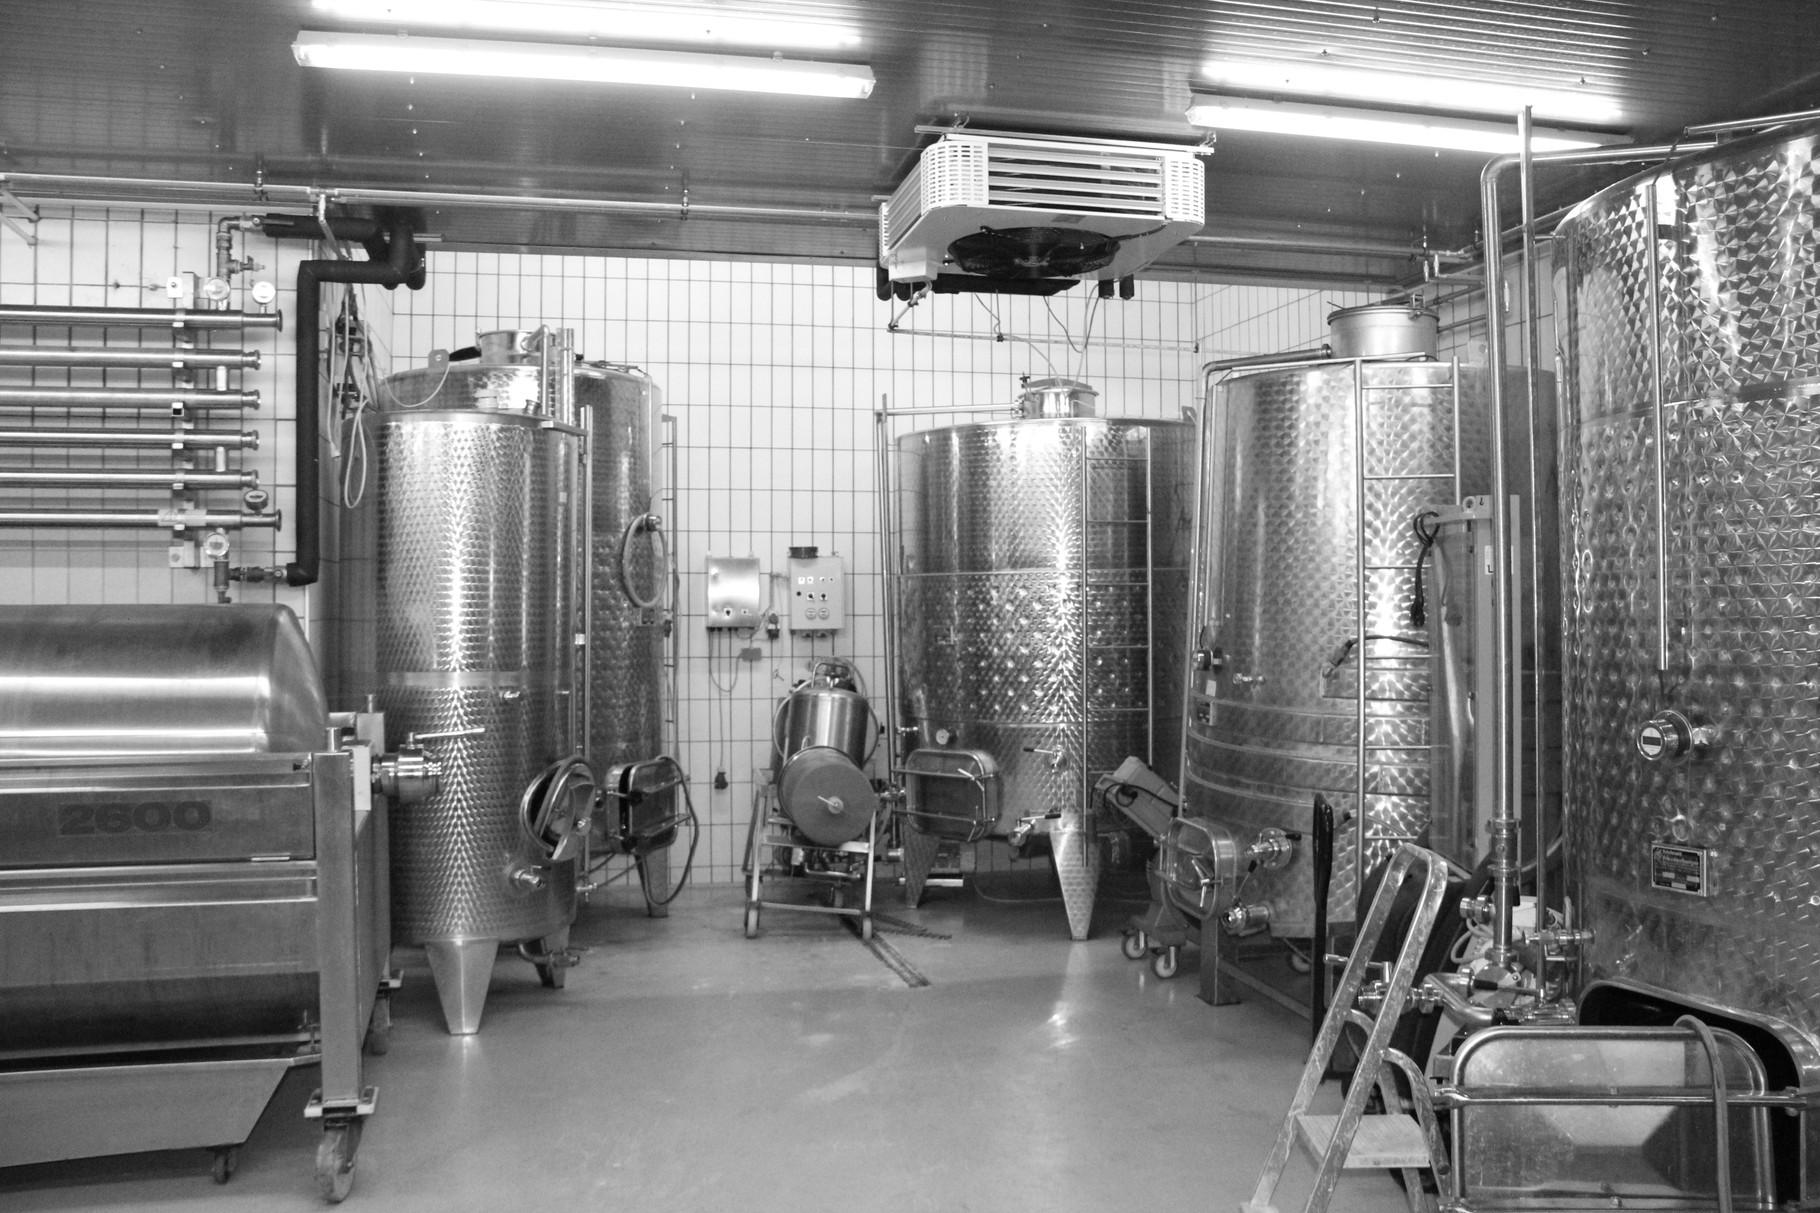 Weingut Arkadenhof Mandl, Rechnitz